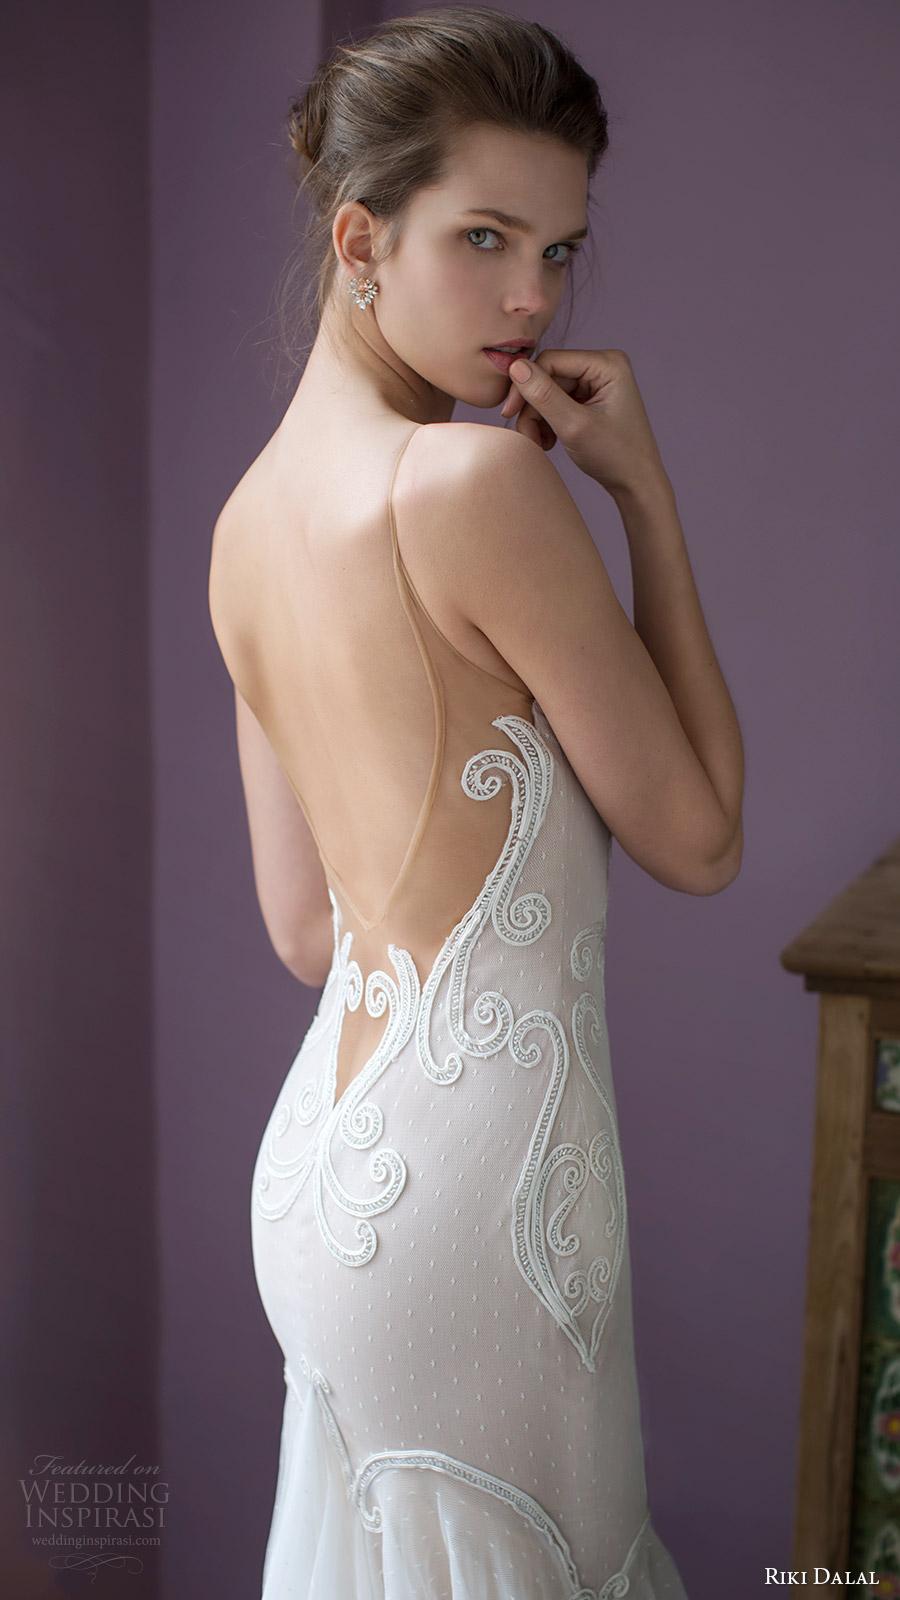 riki dalal bridal 2016 sleeveless deep sweetheart illusion straps mermaid fit flare wedding dress (1807) off white zbv elegant low back